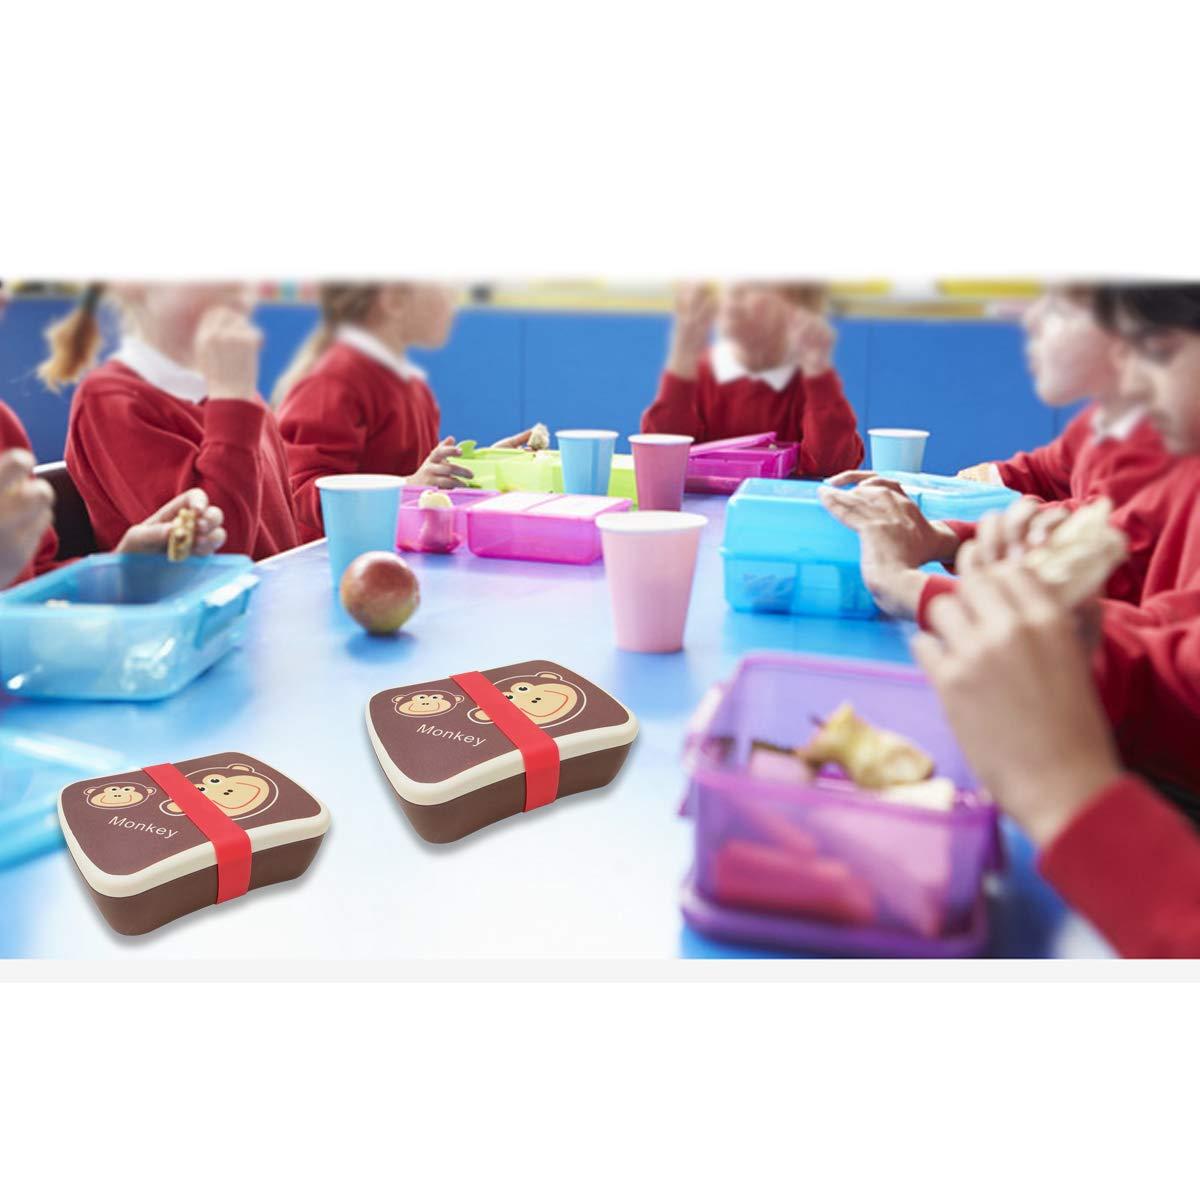 Fiambrera,Tupper,lonchera infantil,Fibra de Bamb/ú,Conjunto Sandwichera y Tupper de bamb/ú.ideal para infantil ni/ños y beb/é,Material ecol/ógico sin BPA Apto para lavavajilla-abeja